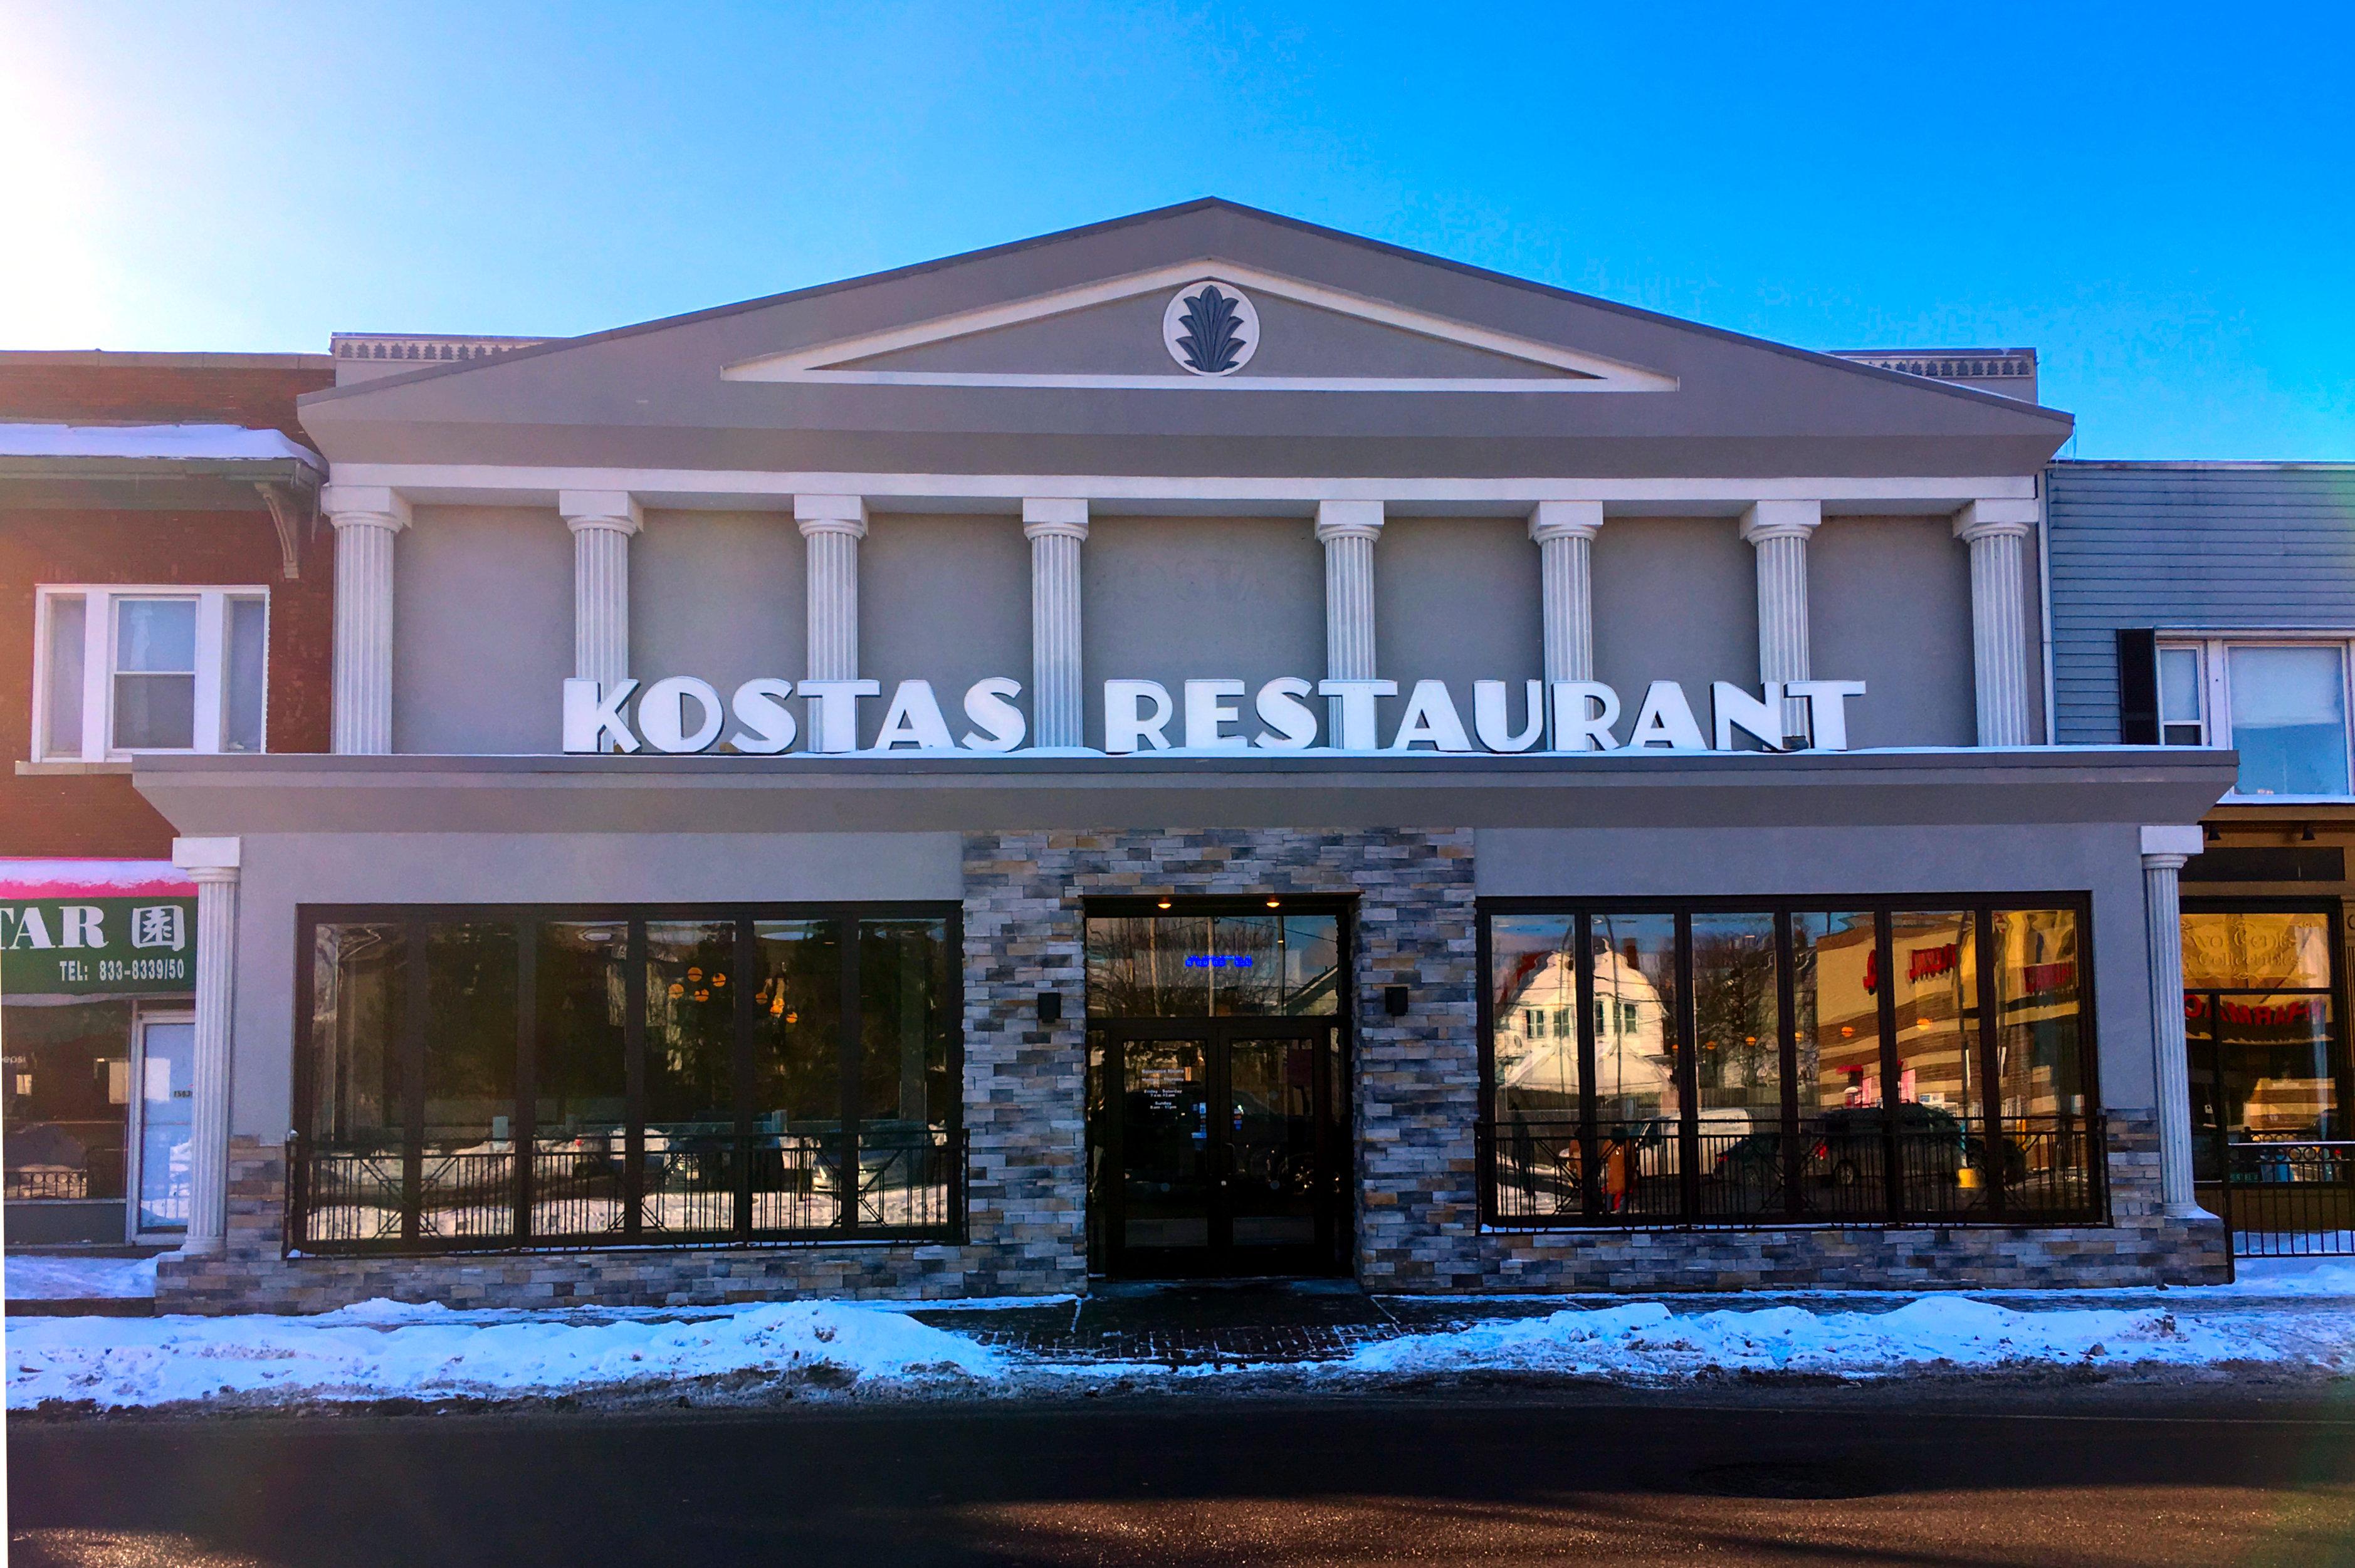 Astonishing Kostas Family Restaurant Buffalo Ny Home Download Free Architecture Designs Scobabritishbridgeorg